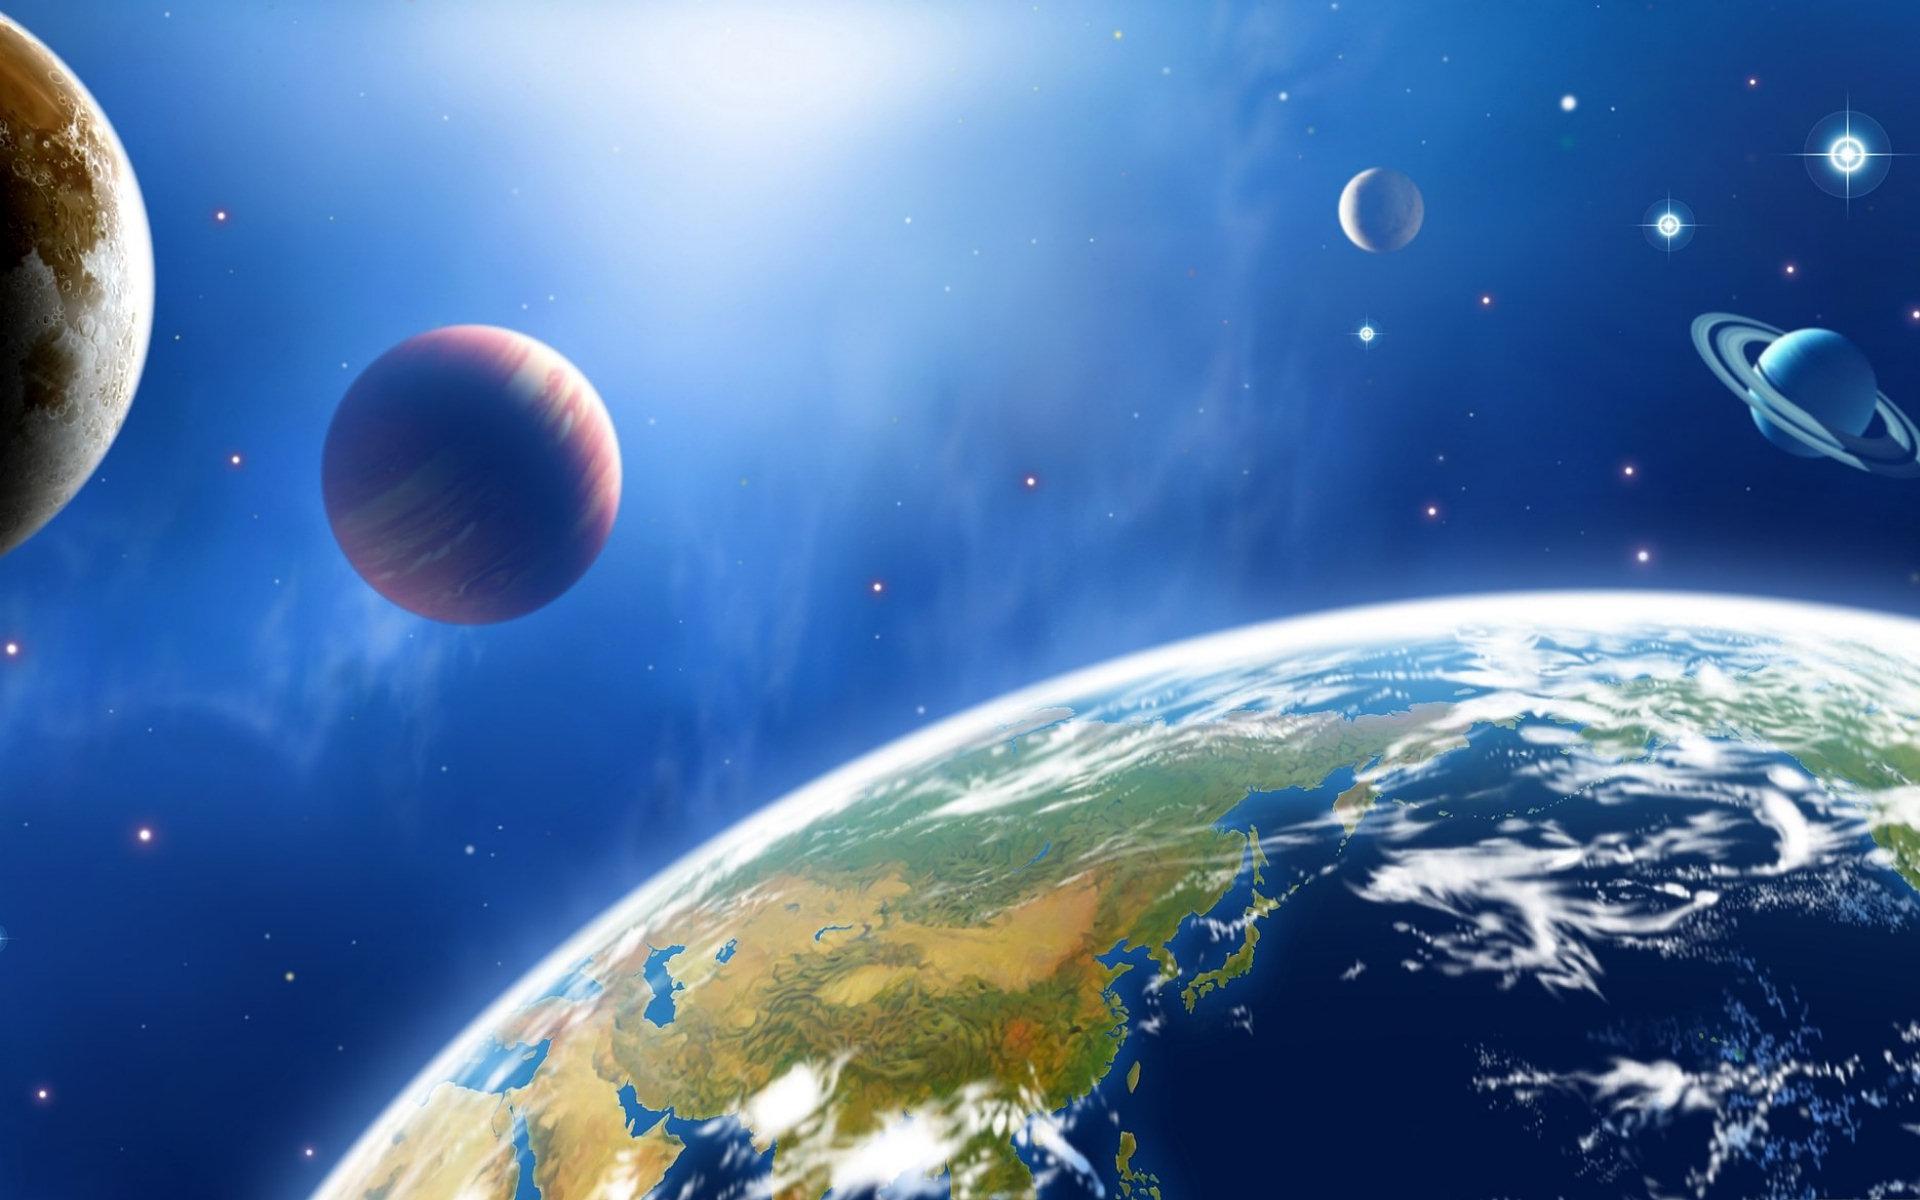 Space exploration hd wallpaper background image - Space explorer wallpaper ...